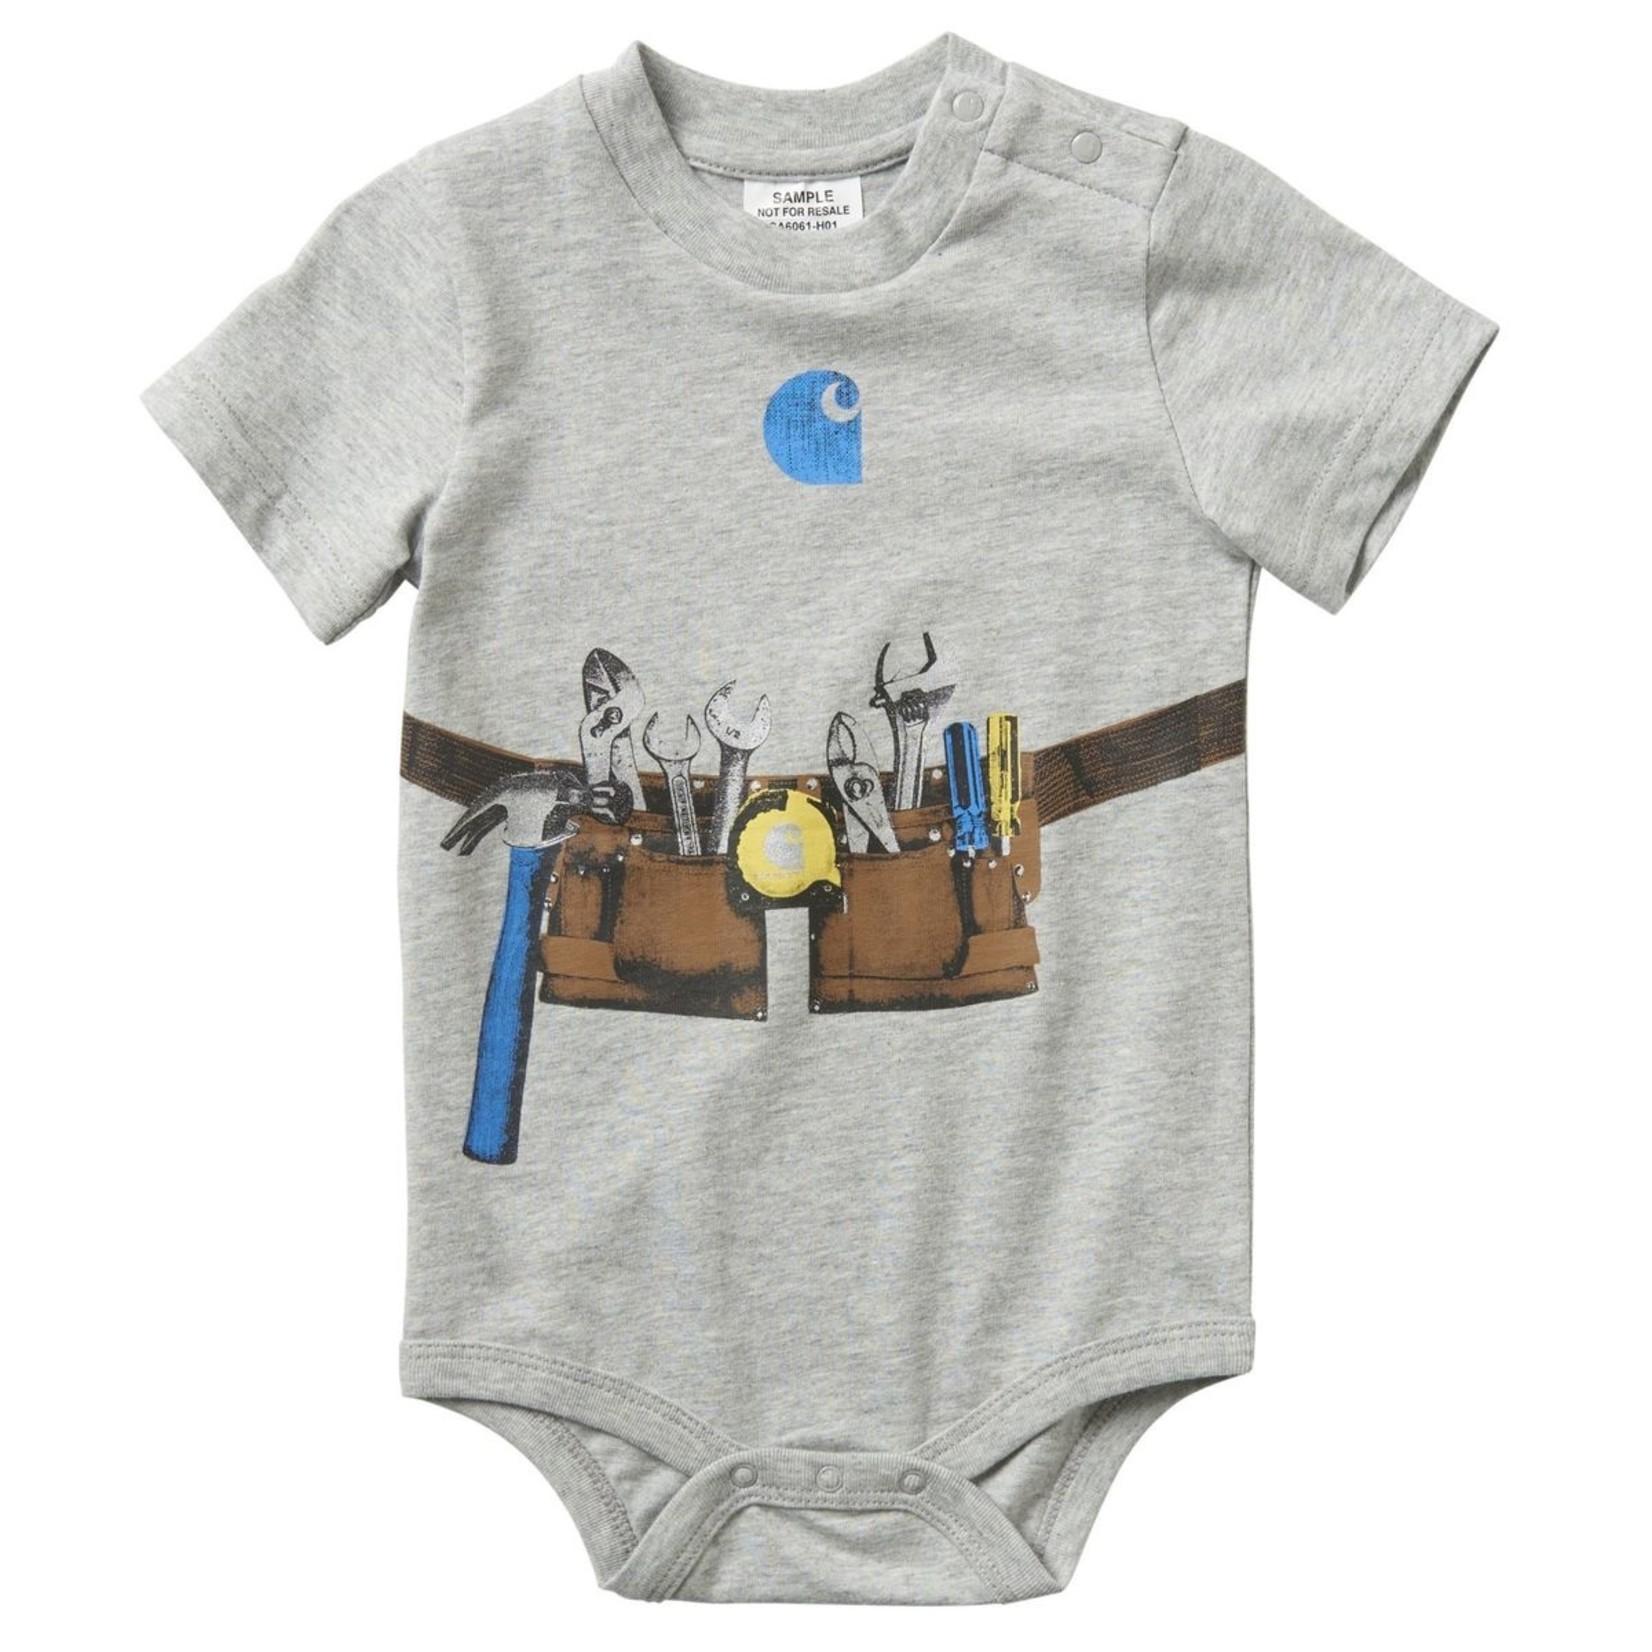 Carhartt Carhartt Kids CA6061 Toolbelt Body Shirt